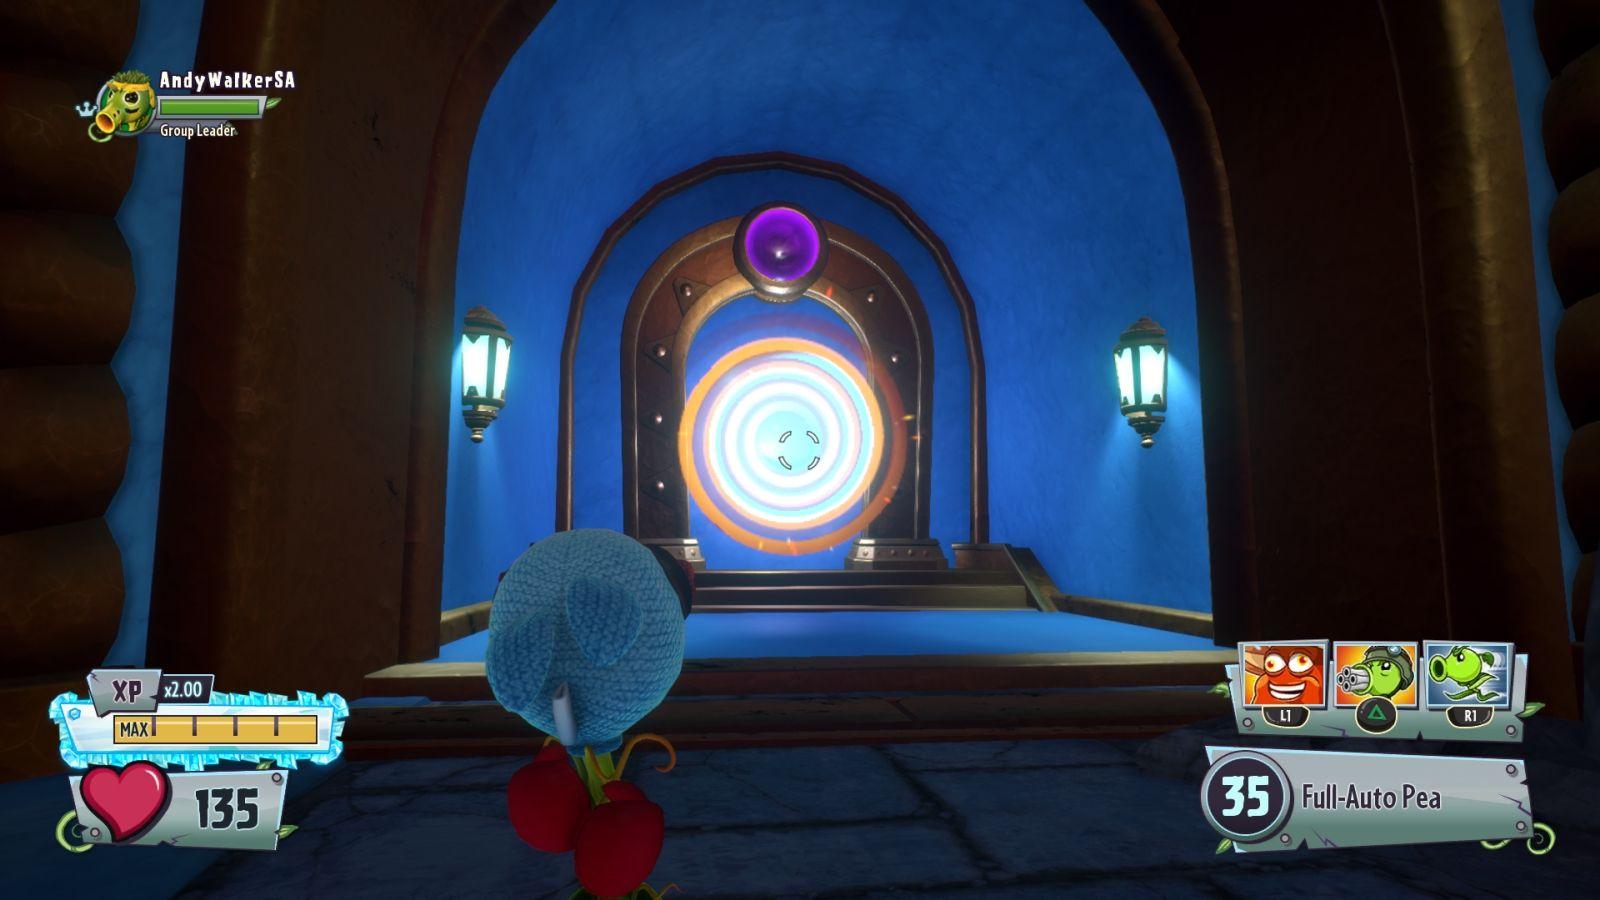 Trials of Gnomus review diary: gaming as a chore - Gearburn